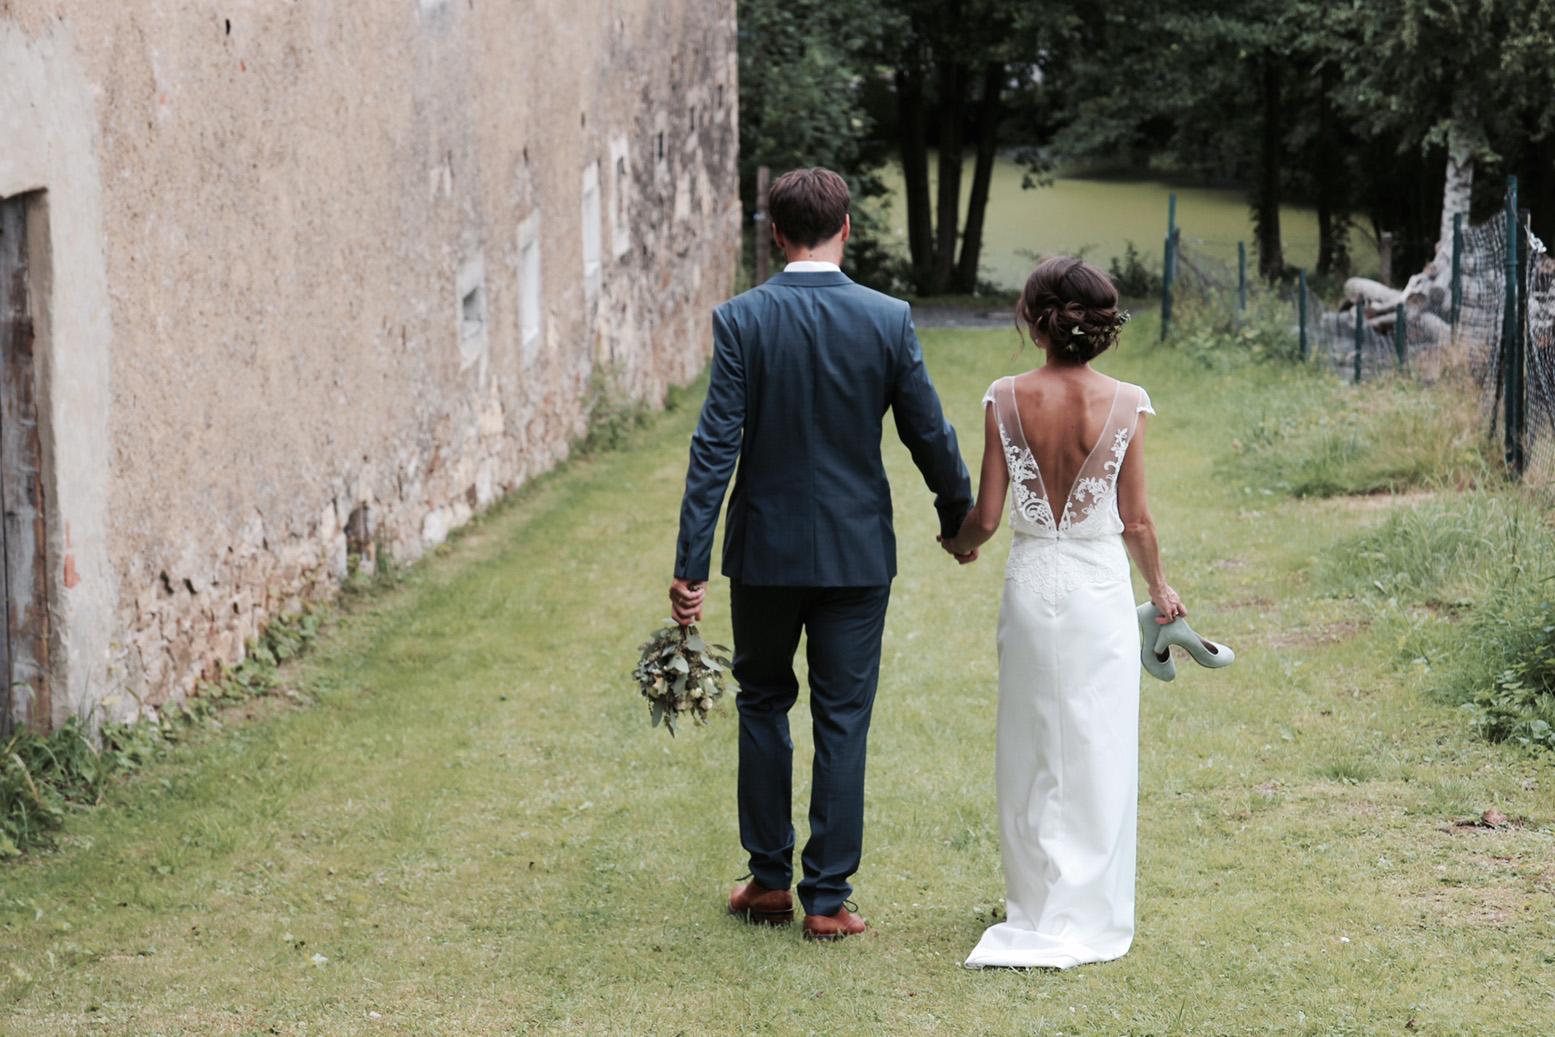 Myrelle_Couture_Marina_Deynega_Hochzeit_Brautmode_kunden3 (9)